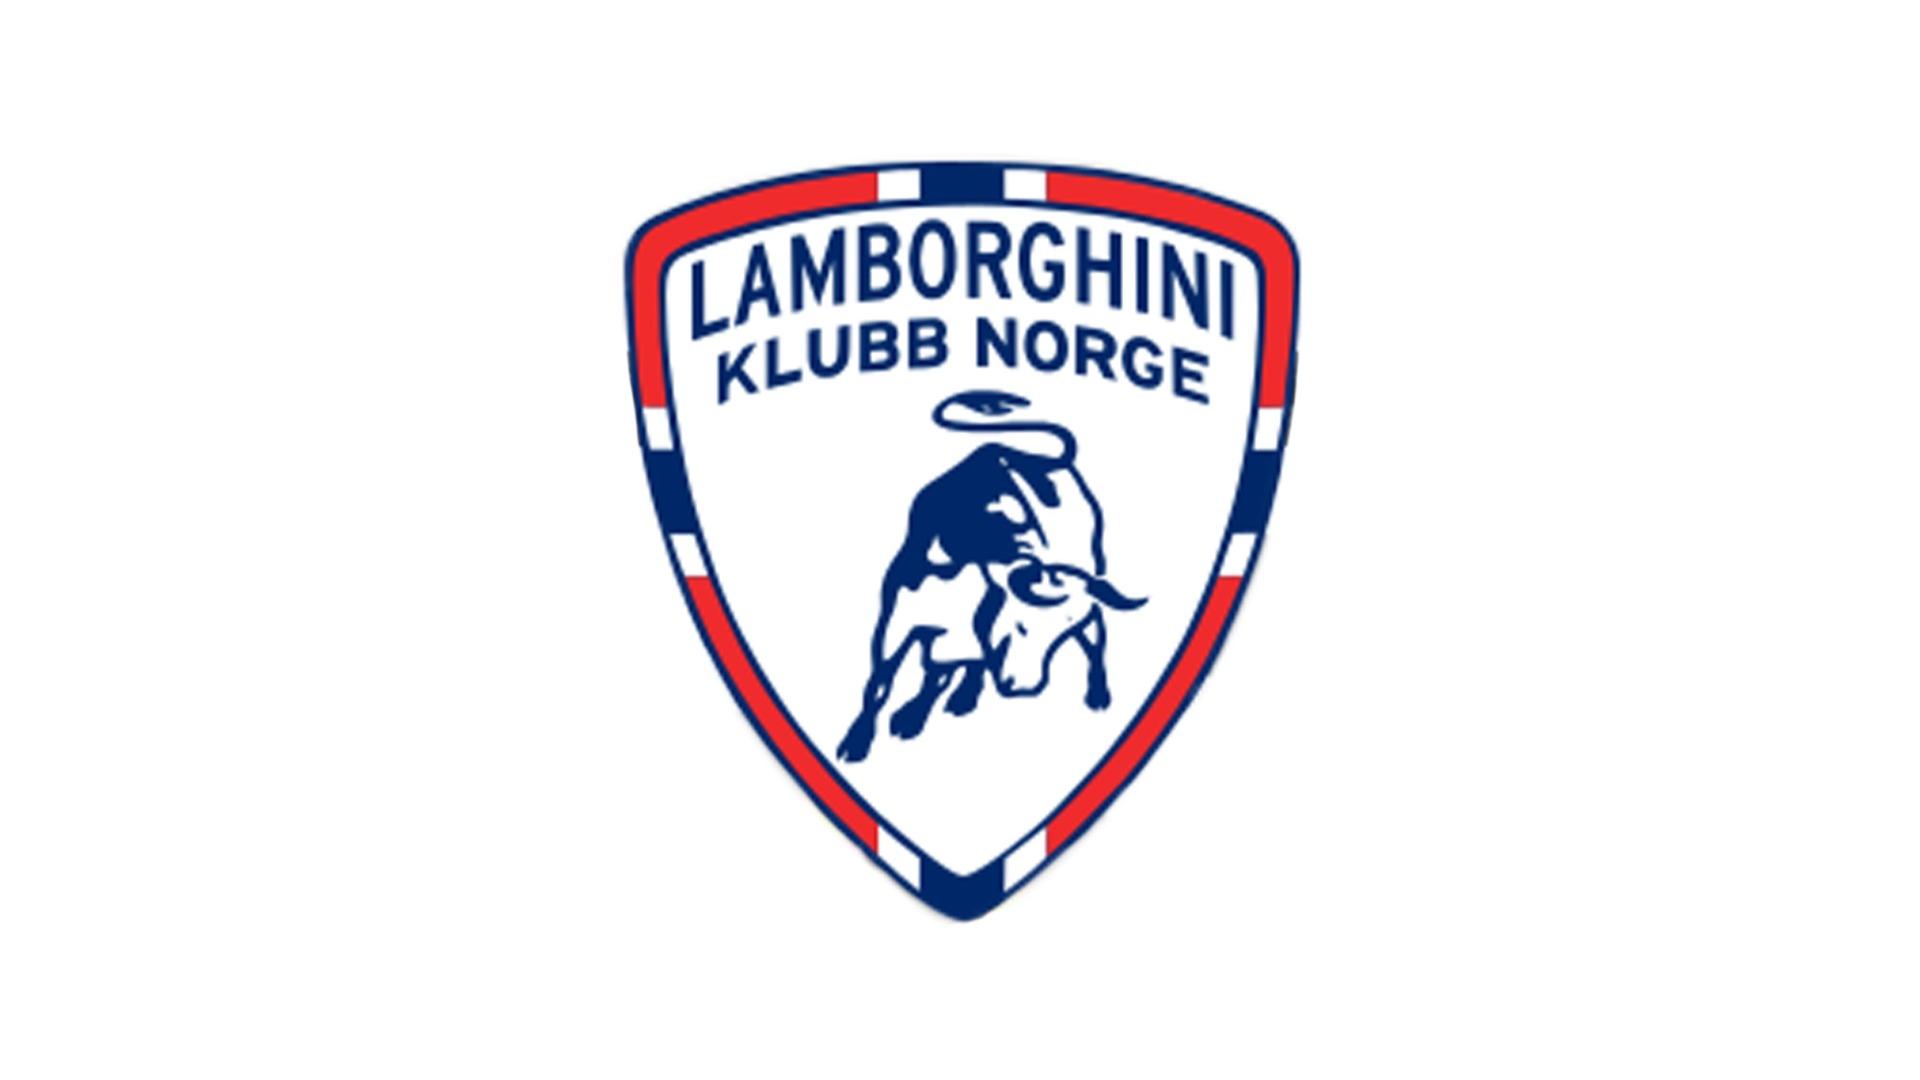 lamborghini+klubb+norge-Fullskjerm.jpg